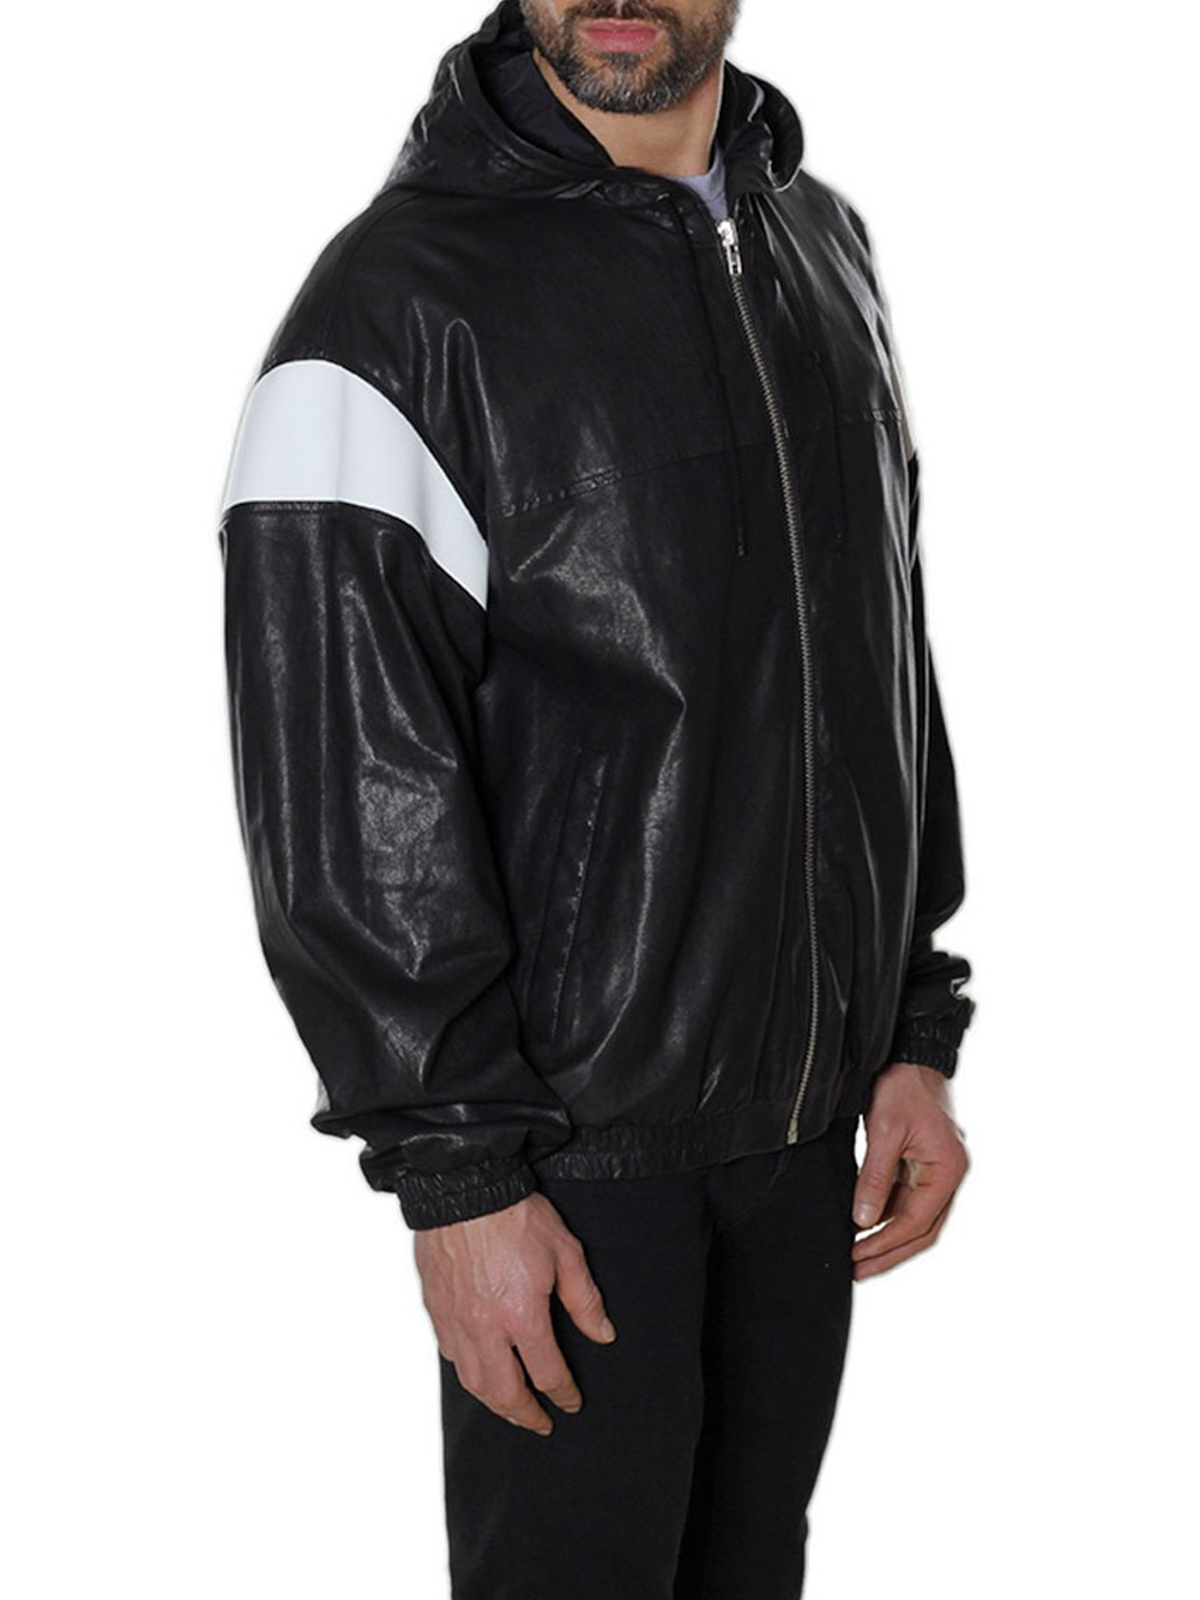 db47ce61 Kenzo - Hyper KENZO leather jacket - leather jacket - 5BL9180AA99